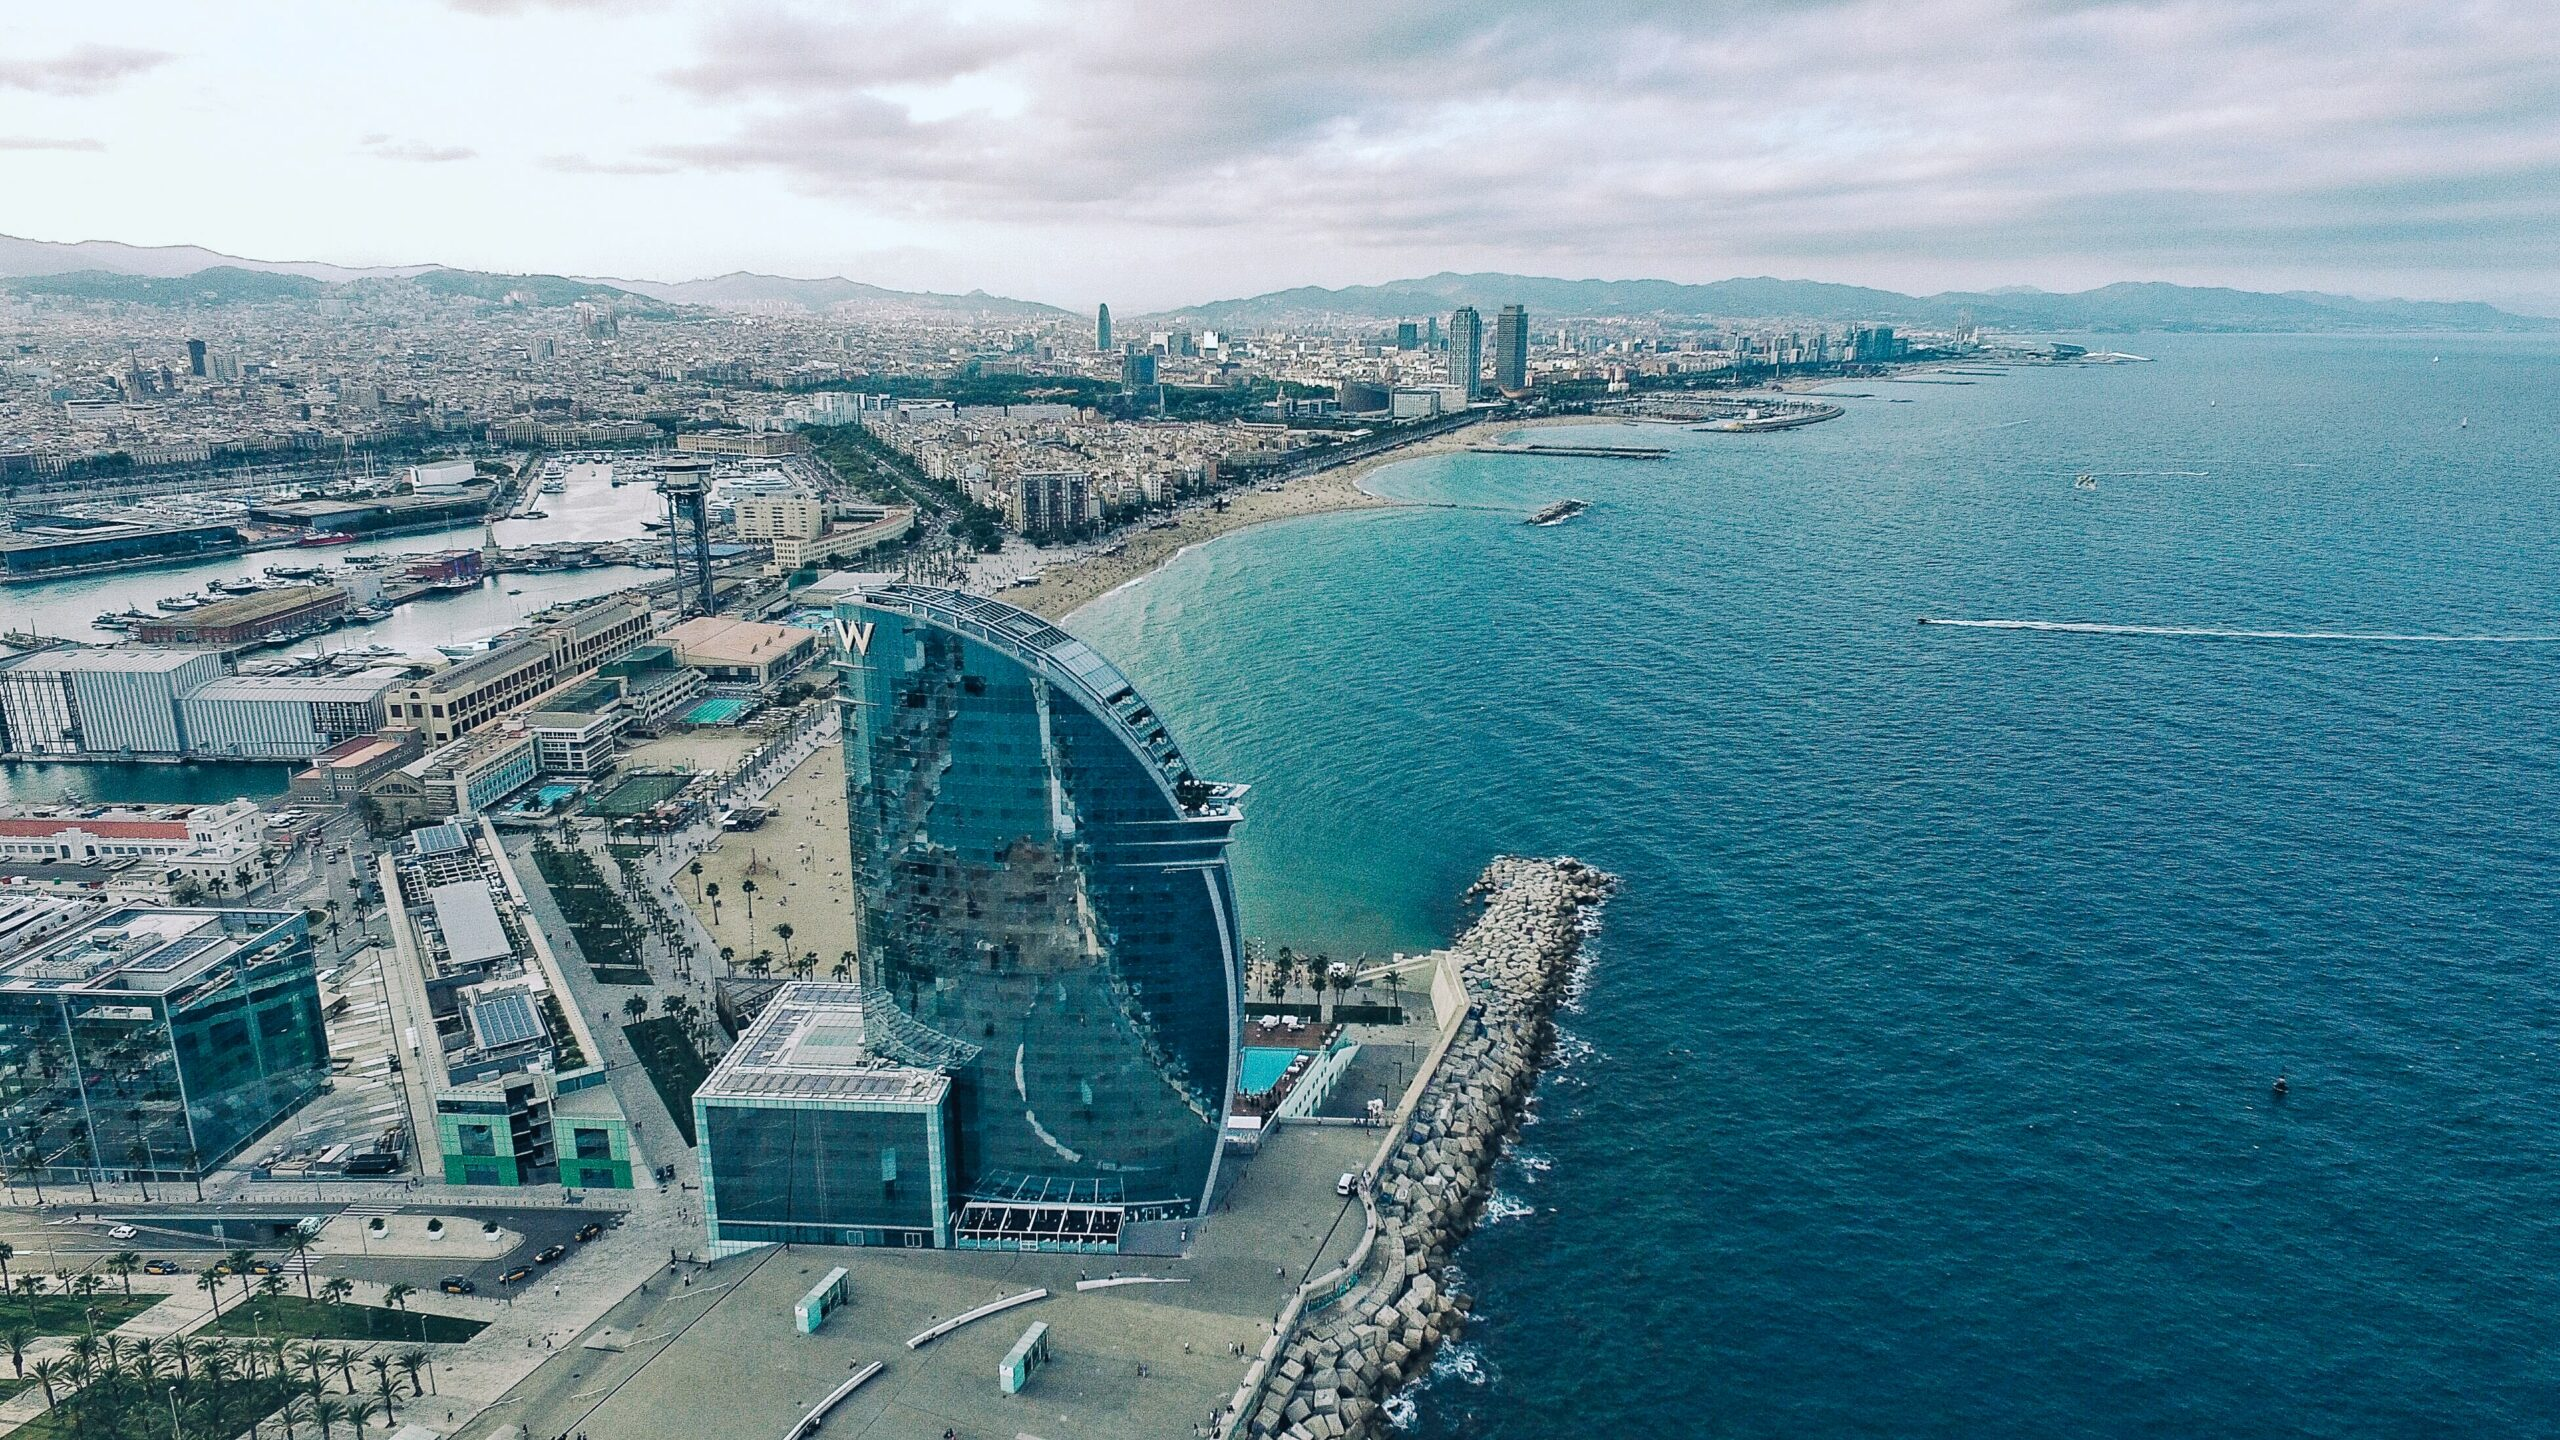 Un estudio de la Generalitat identifica 1.700 startups en Cataluña